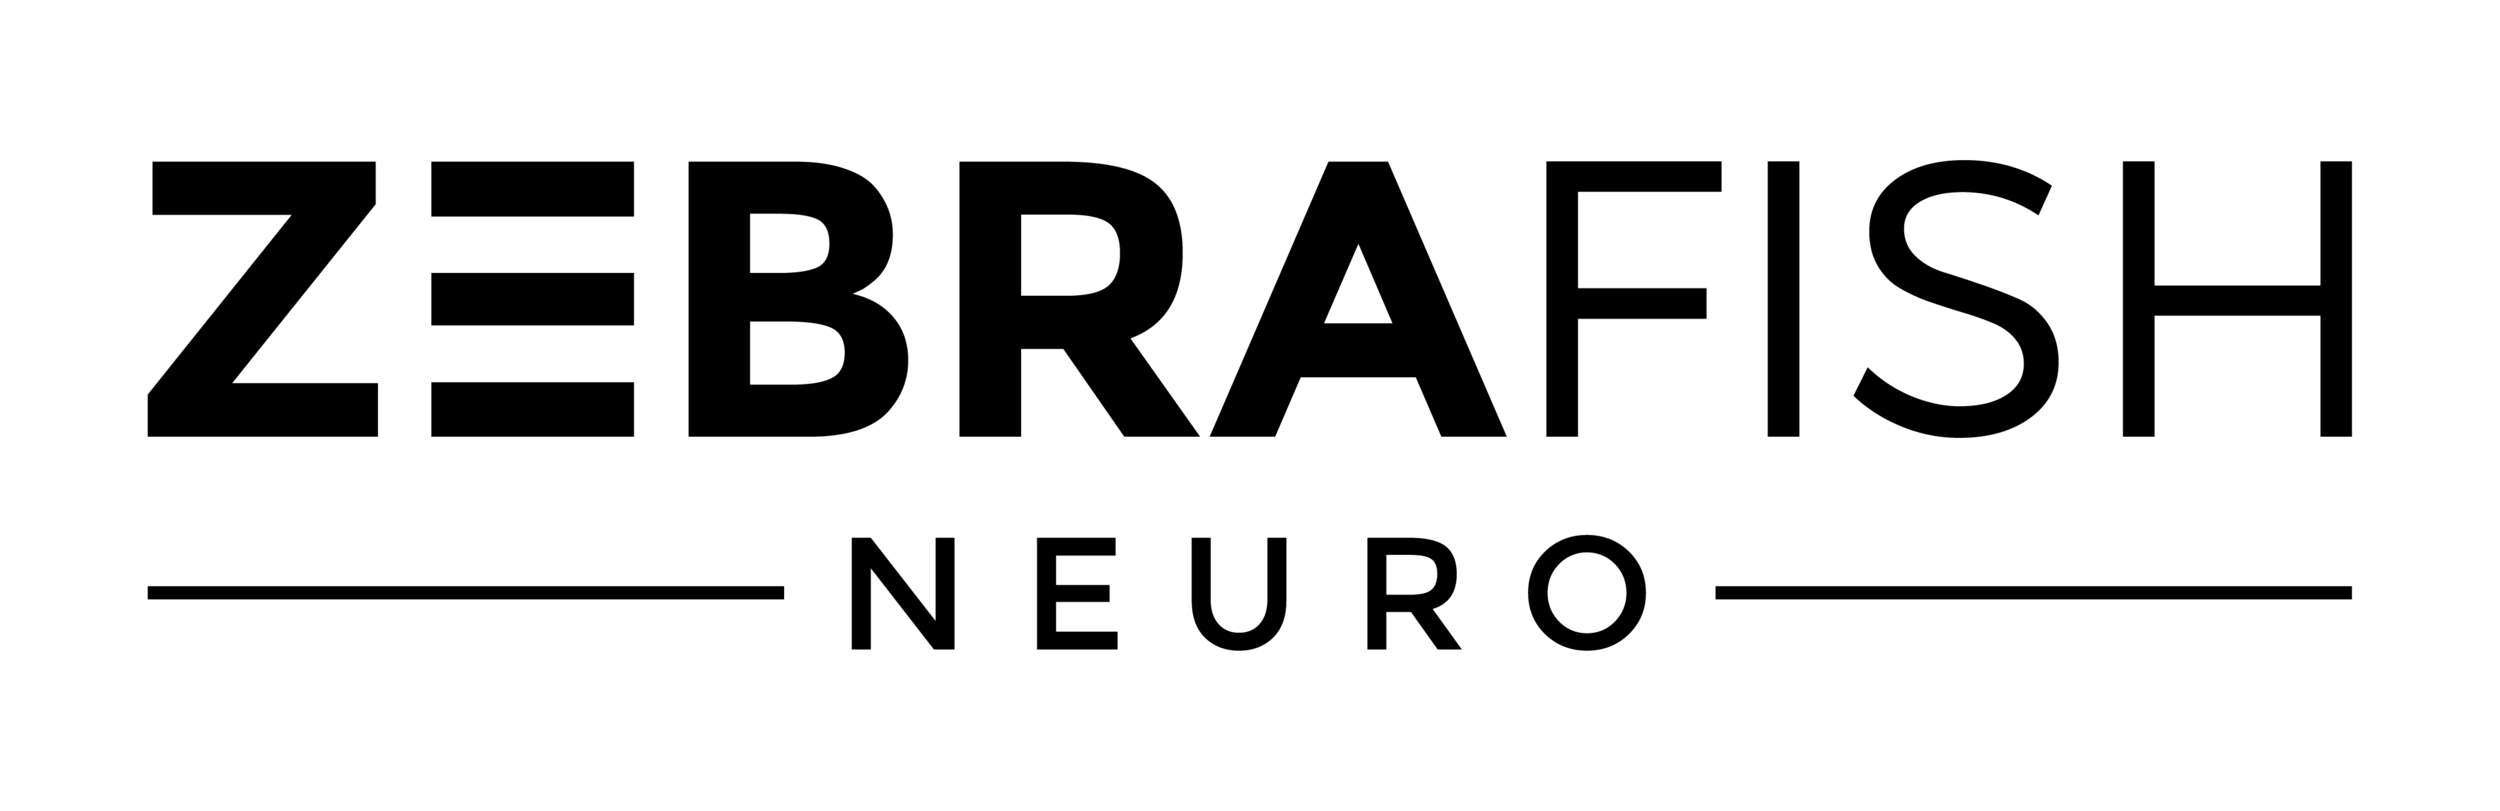 Zebrafish logo.png